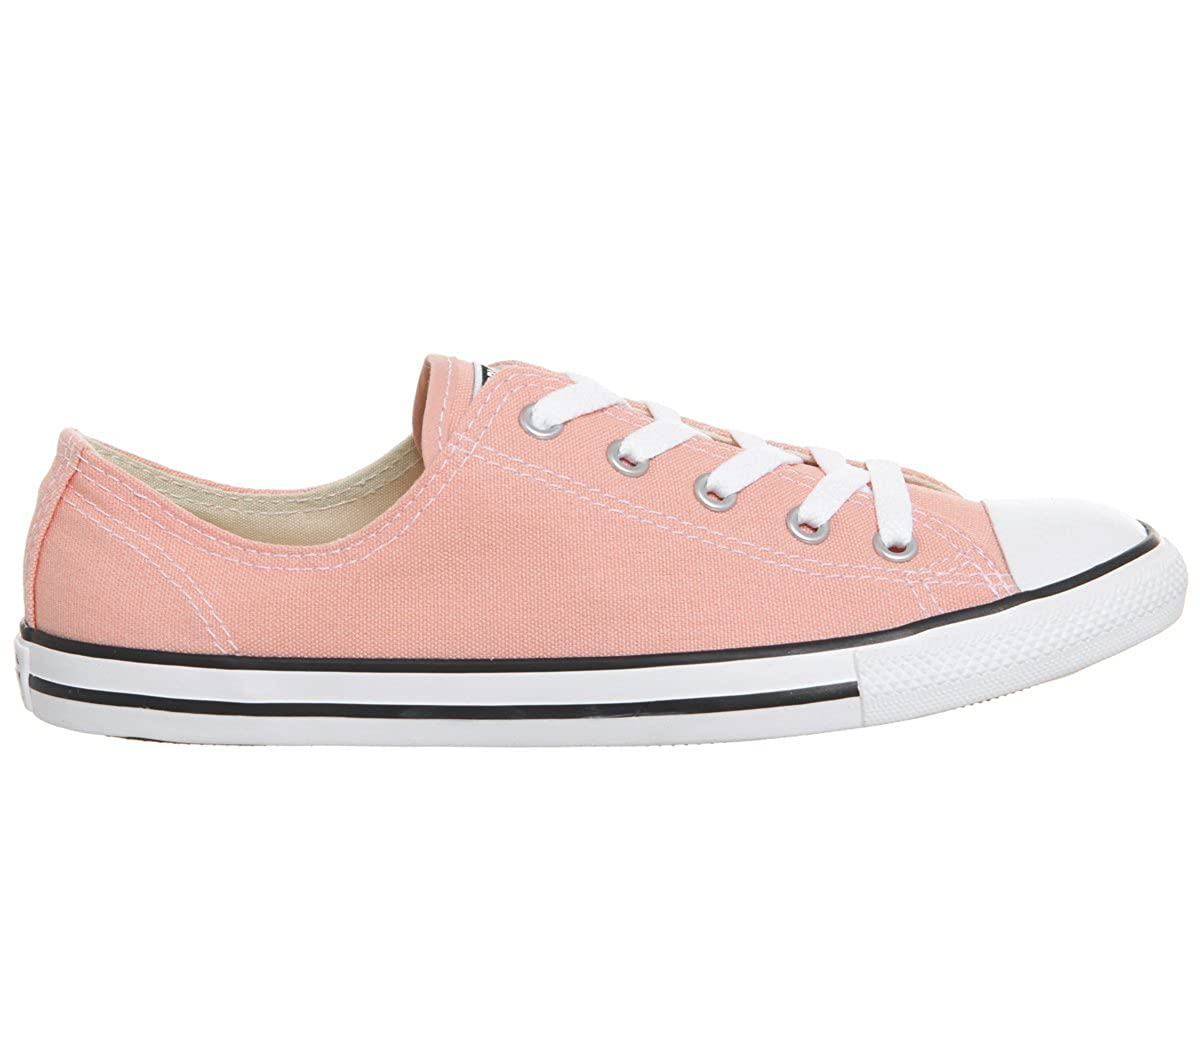 Converse Women''s Chuck Taylor CTAS Dainty Ox Canvas Fitness Shoes 559833C